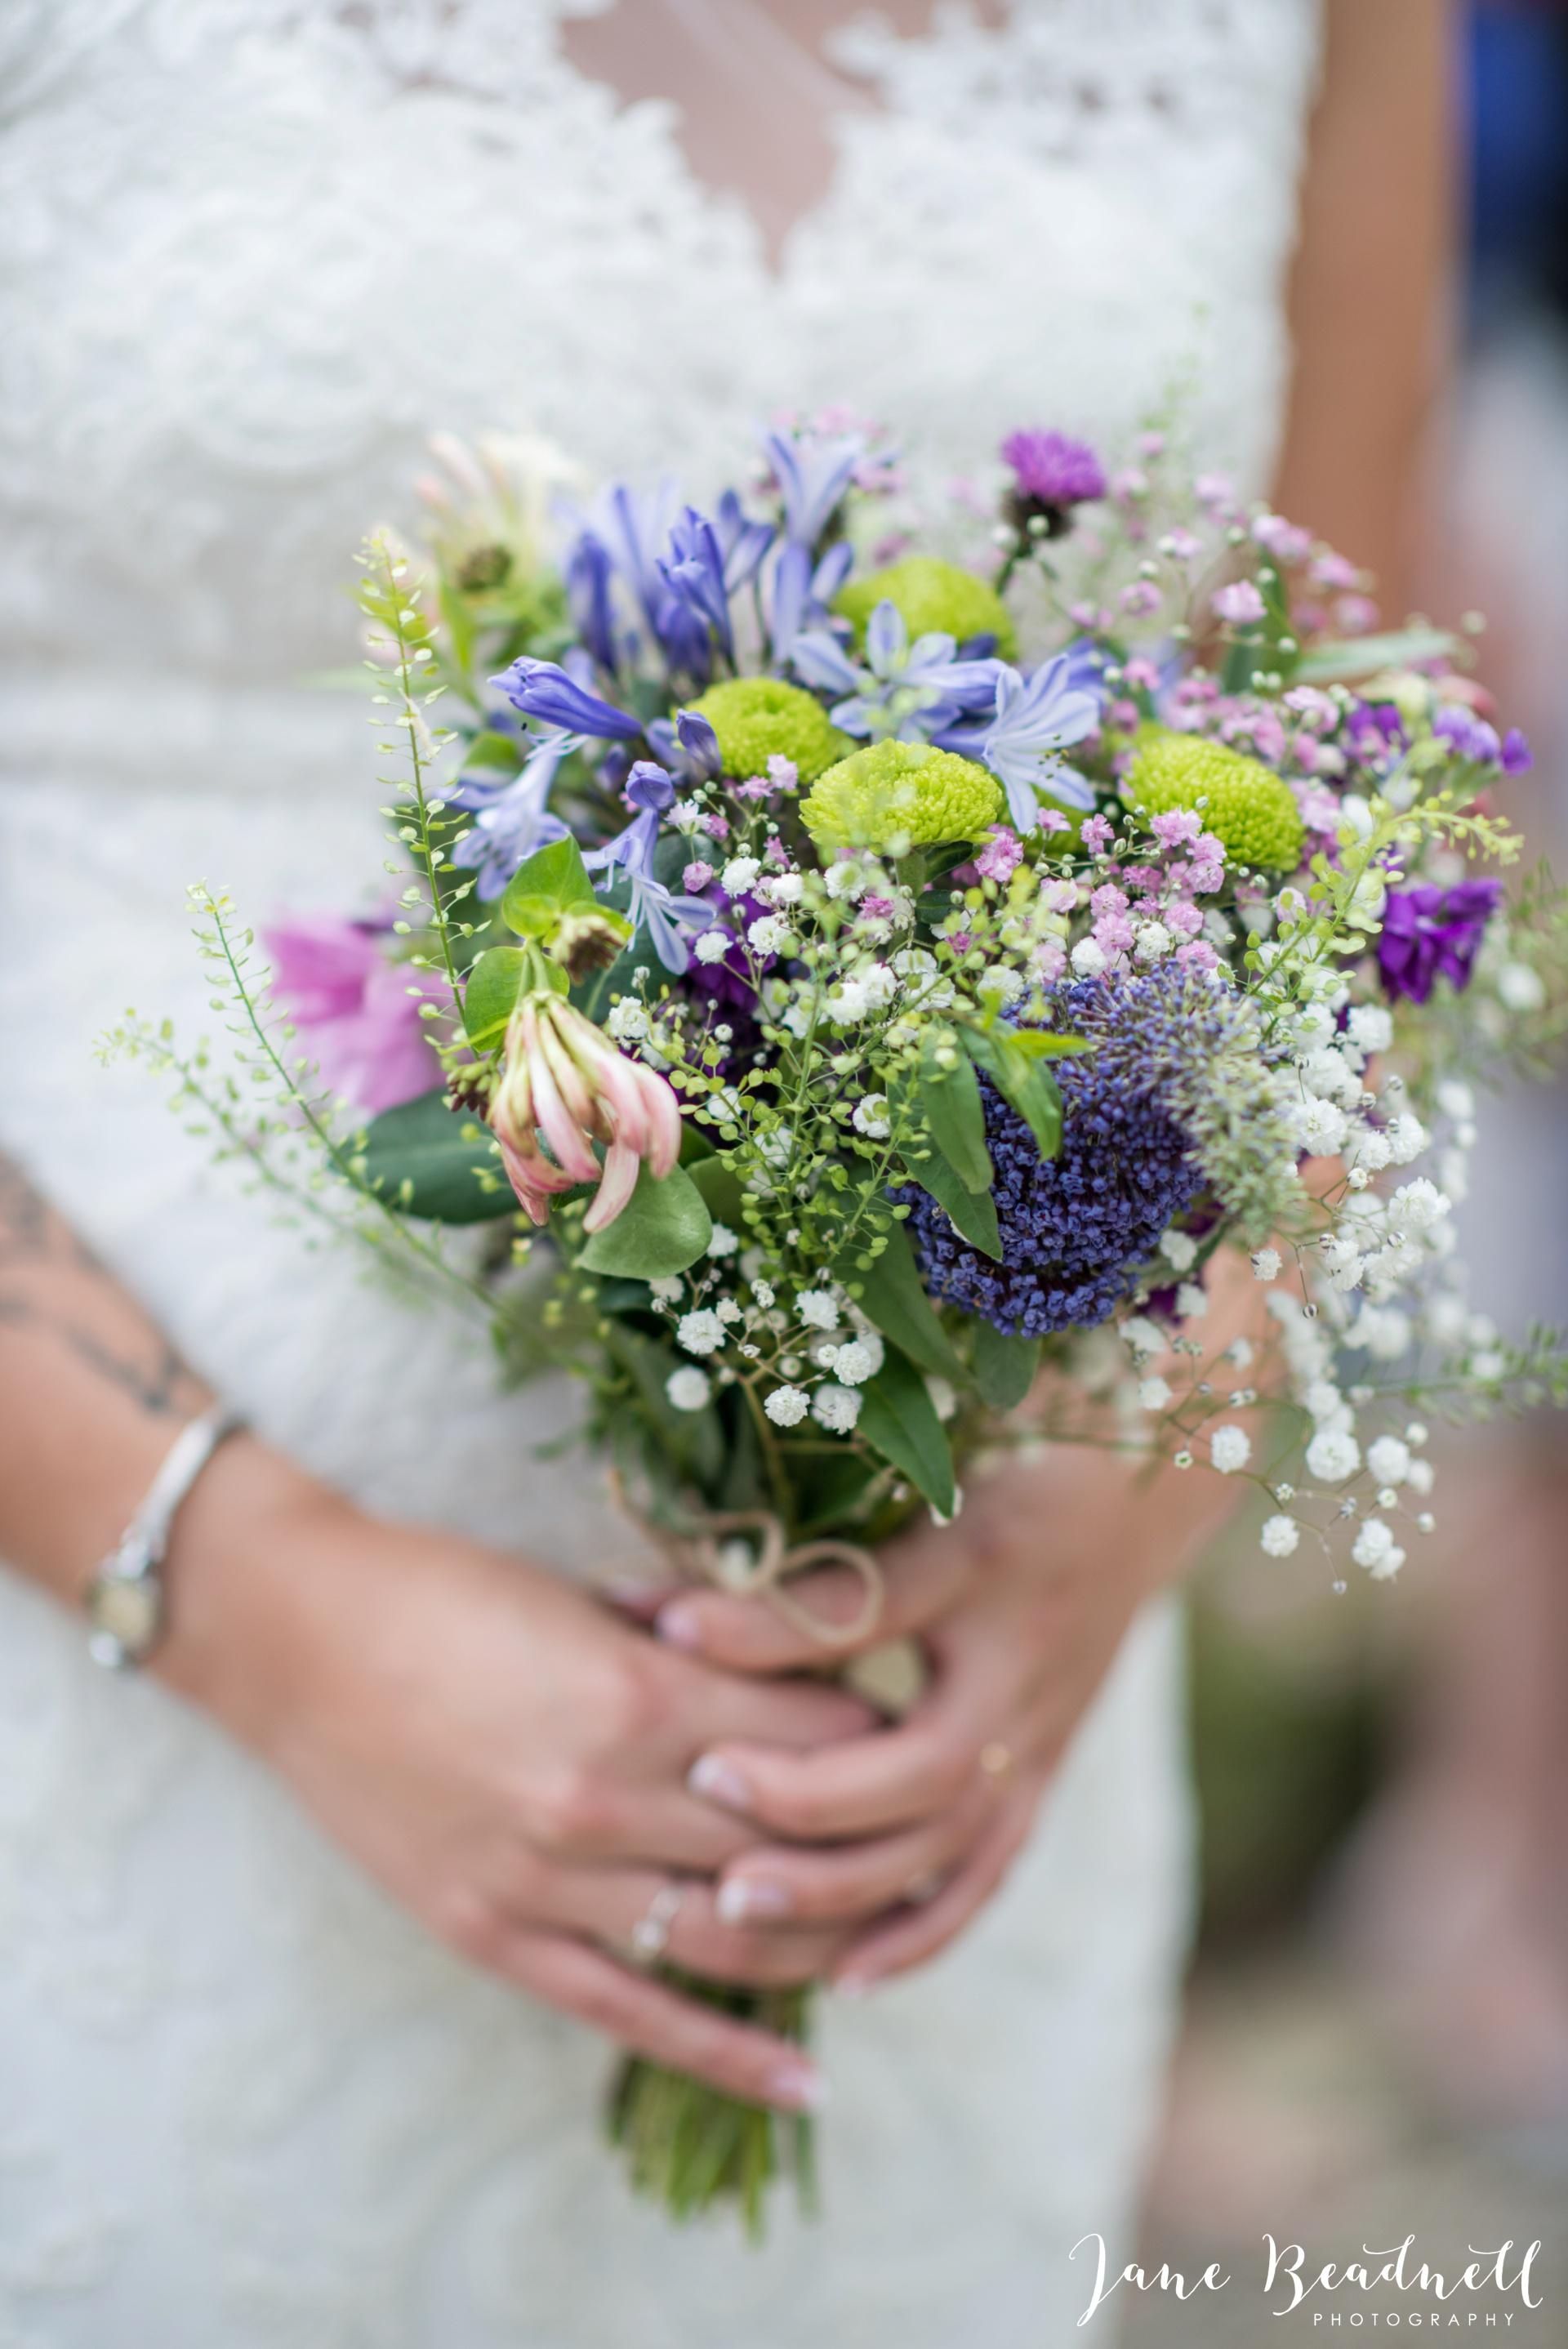 Jane Beadnell fine art wedding photographer The Old Deanery Ripon_0044